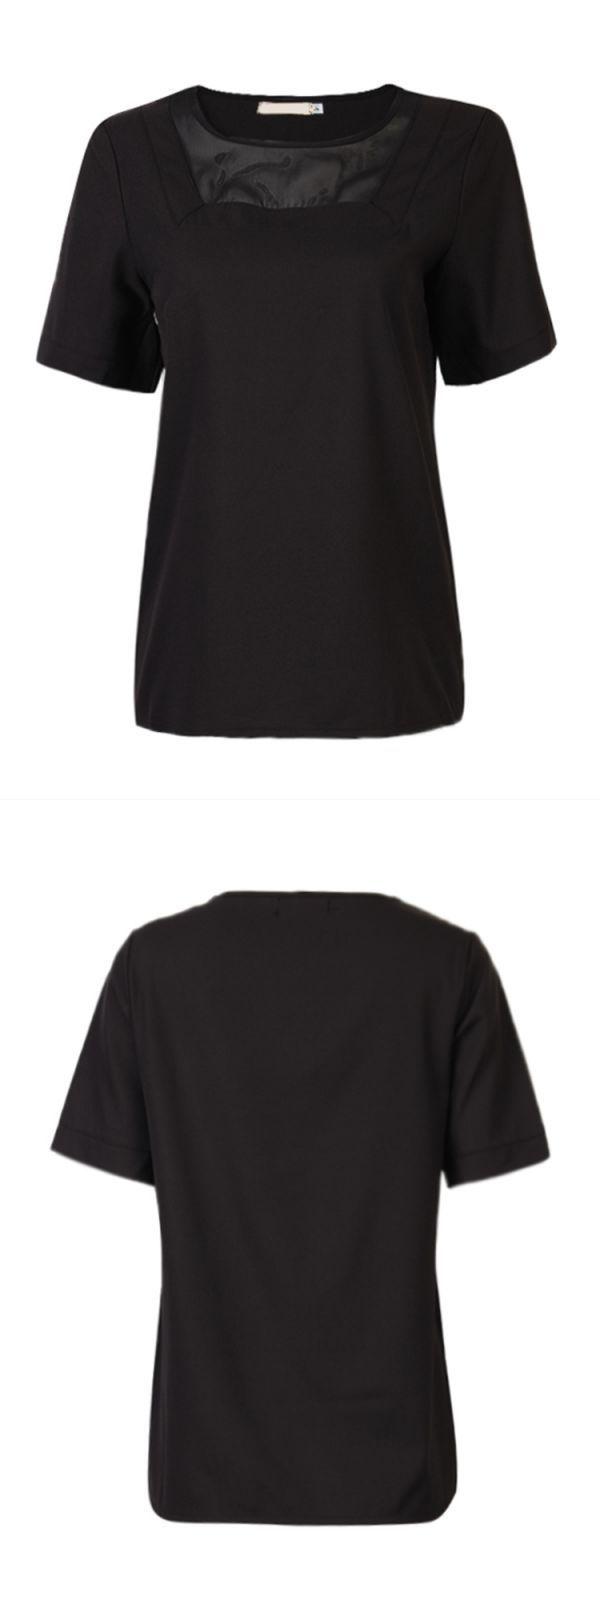 T shirts wonder woman casual women simple chiffon perspective gauze short sleeve stitching t-shirt #john #lewis #womens #t #shirts #t #shirt #pin #up #girl #vince #t #shirts #womens #uk #womens #kiss #t #shirts